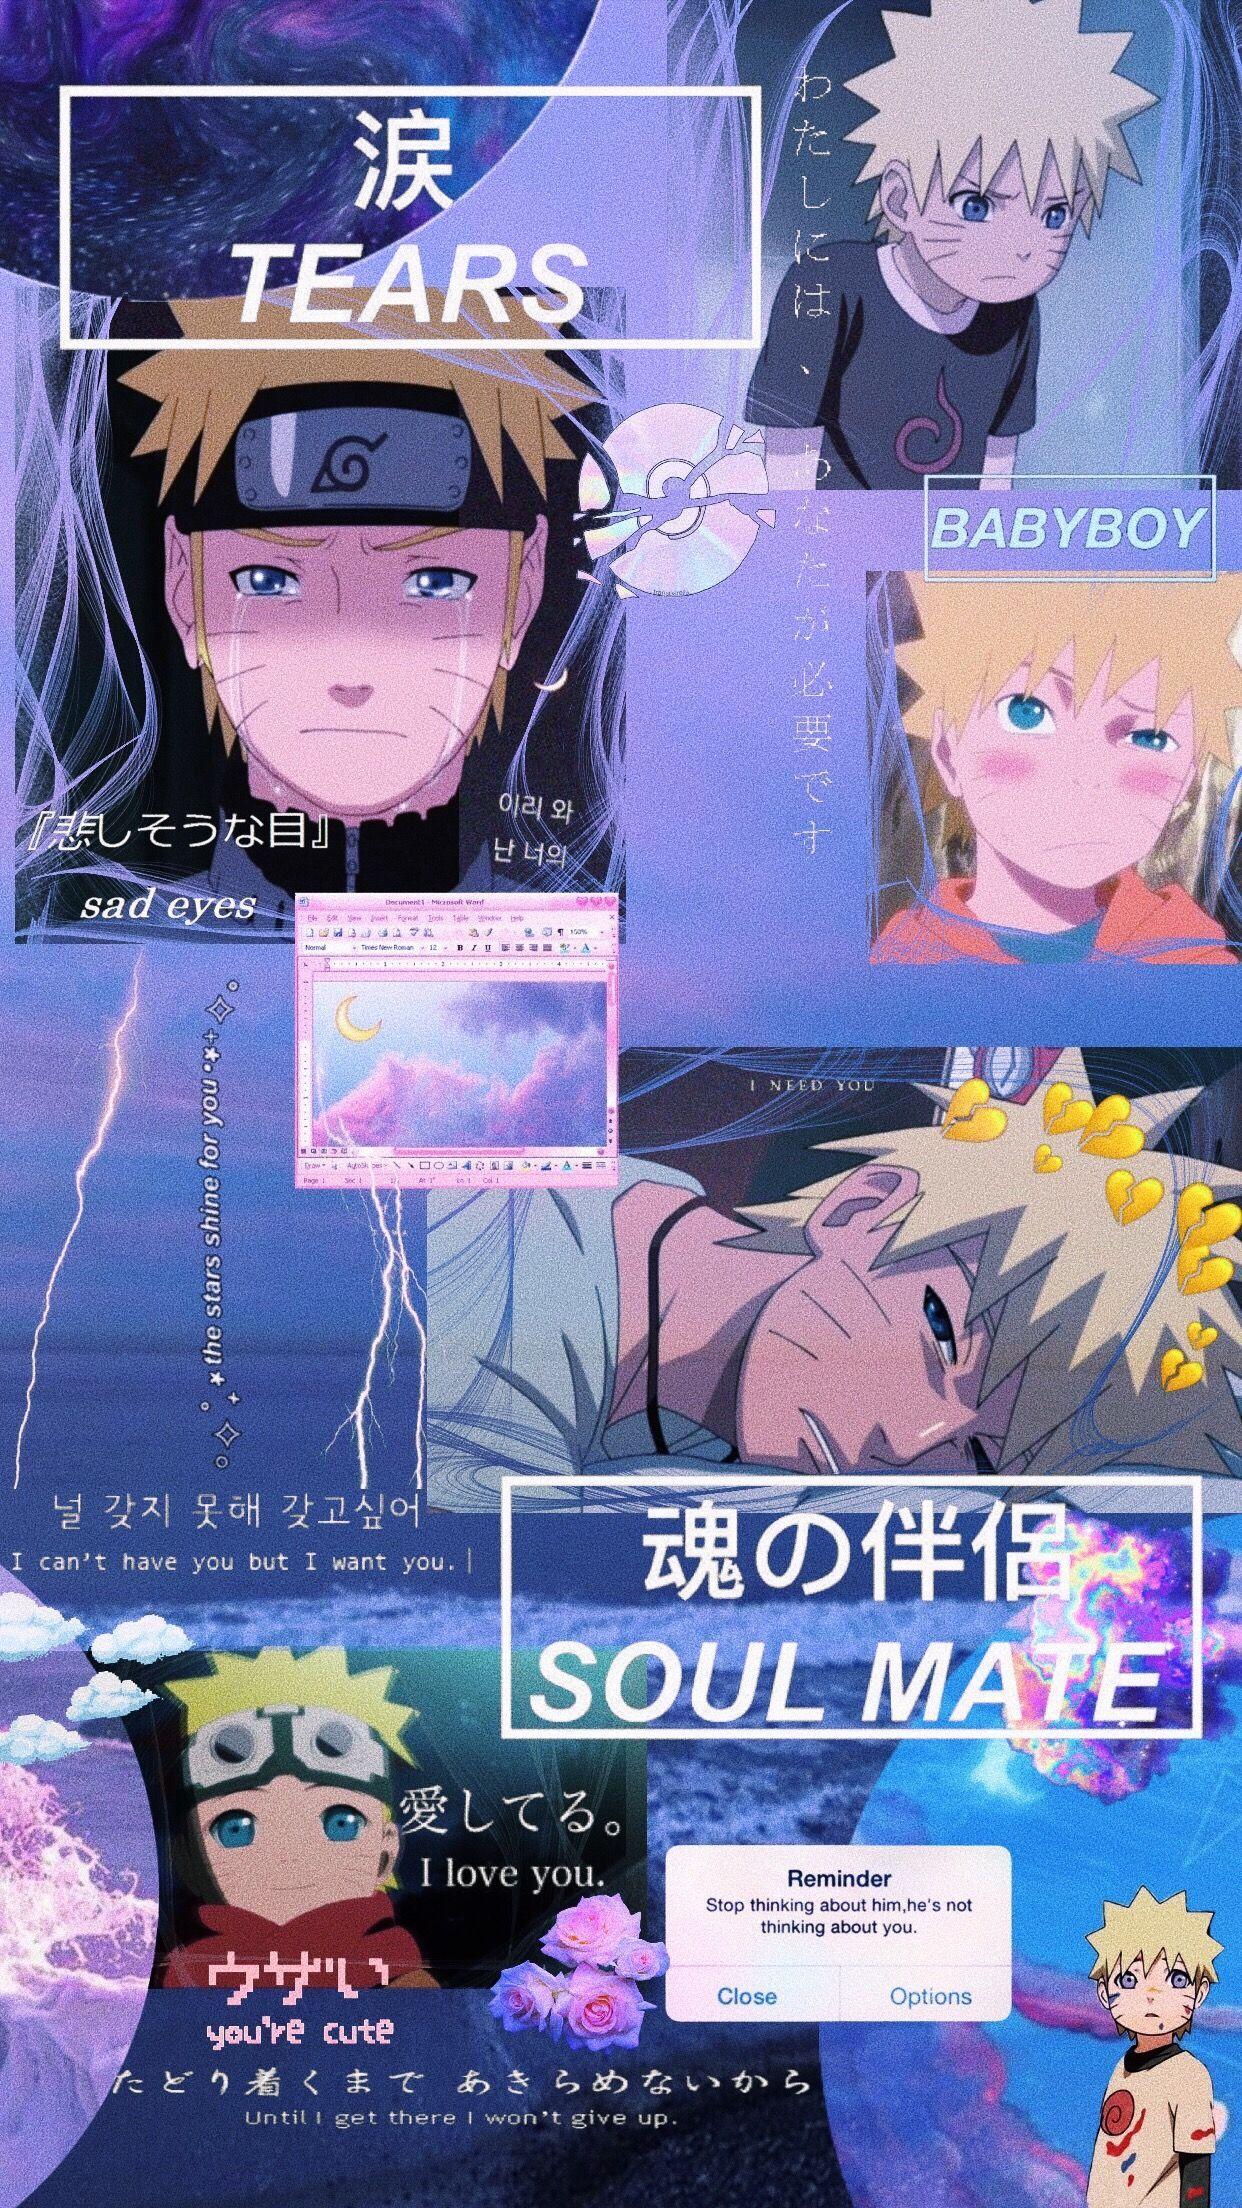 Naruto Anime Narutoshippuden Aesthetic Edit Wallpaper In 2020 Anime Wallpaper Iphone Naruto Cute Wallpaper Naruto Shippuden